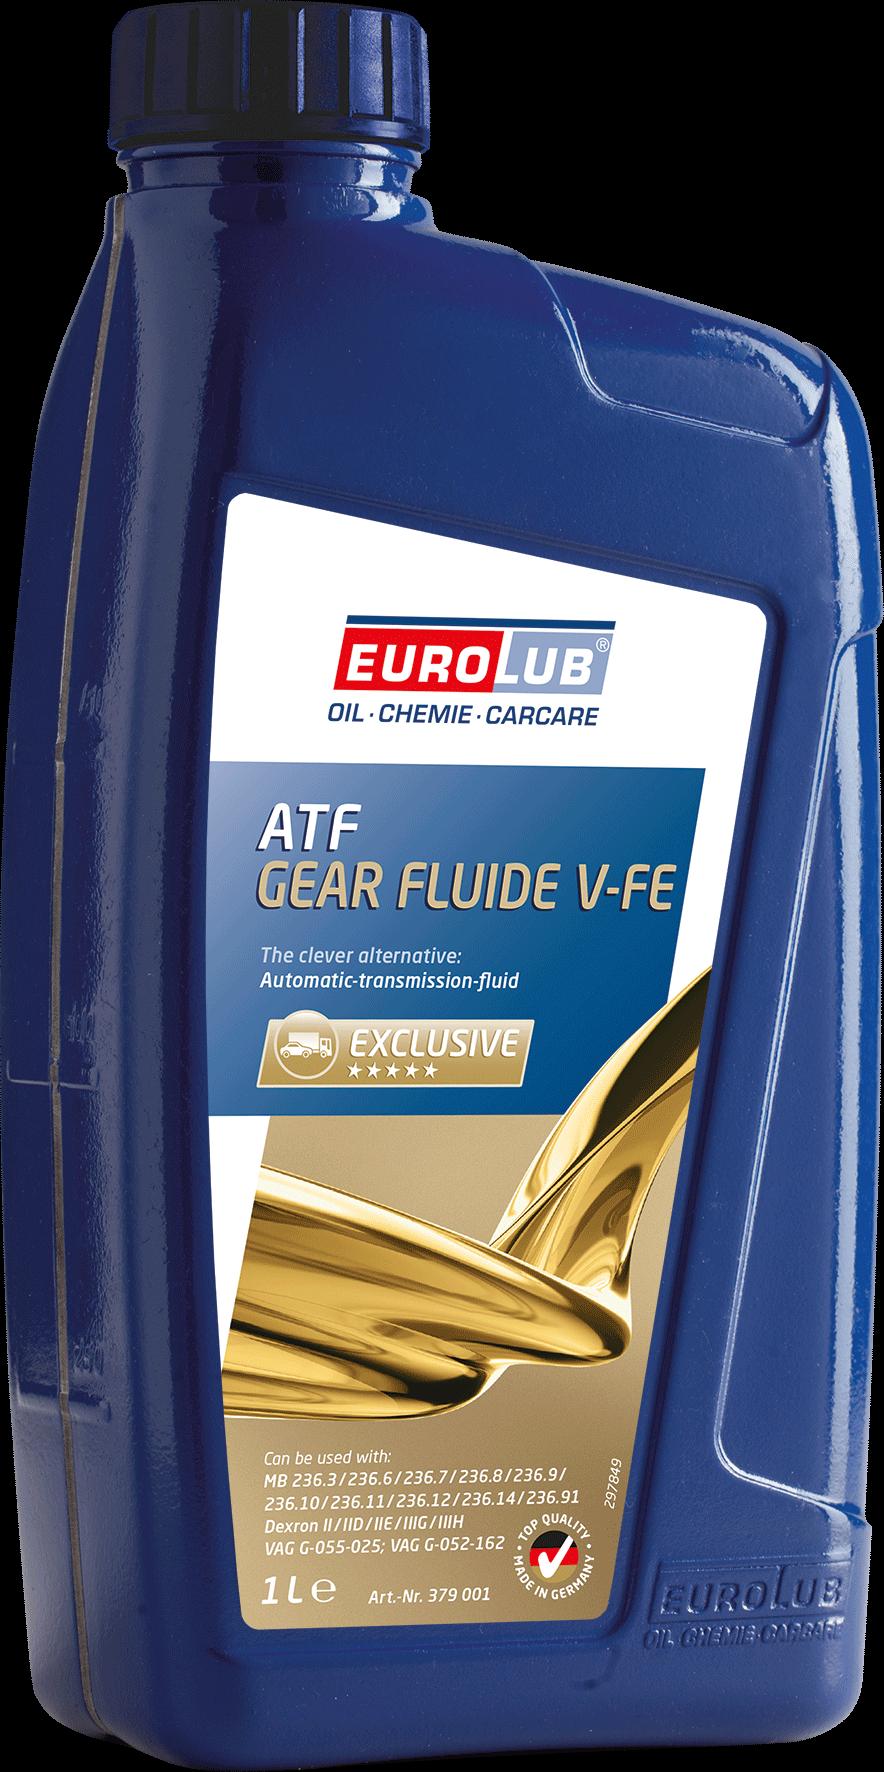 EUROLUB Gear Fluide V-FE, 1л